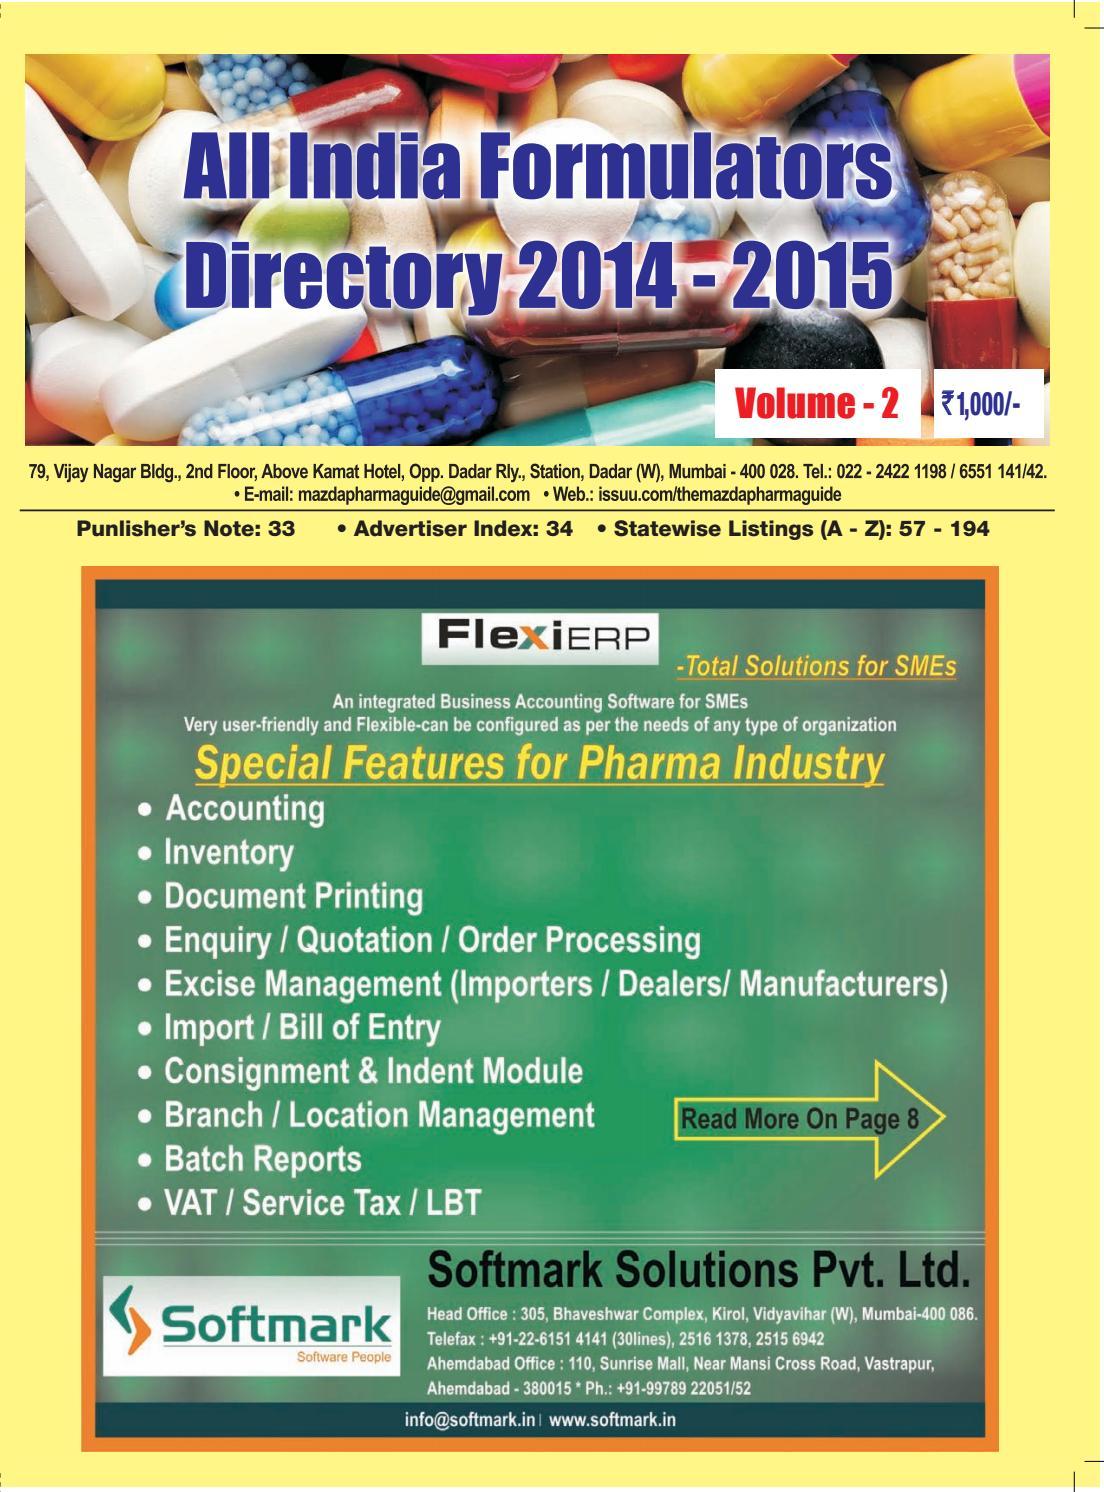 Famciclovir 125 mg.doc - All India Formulators Directory 2014 15 Volume 2 By The Mazada Pharma Guide Issuu